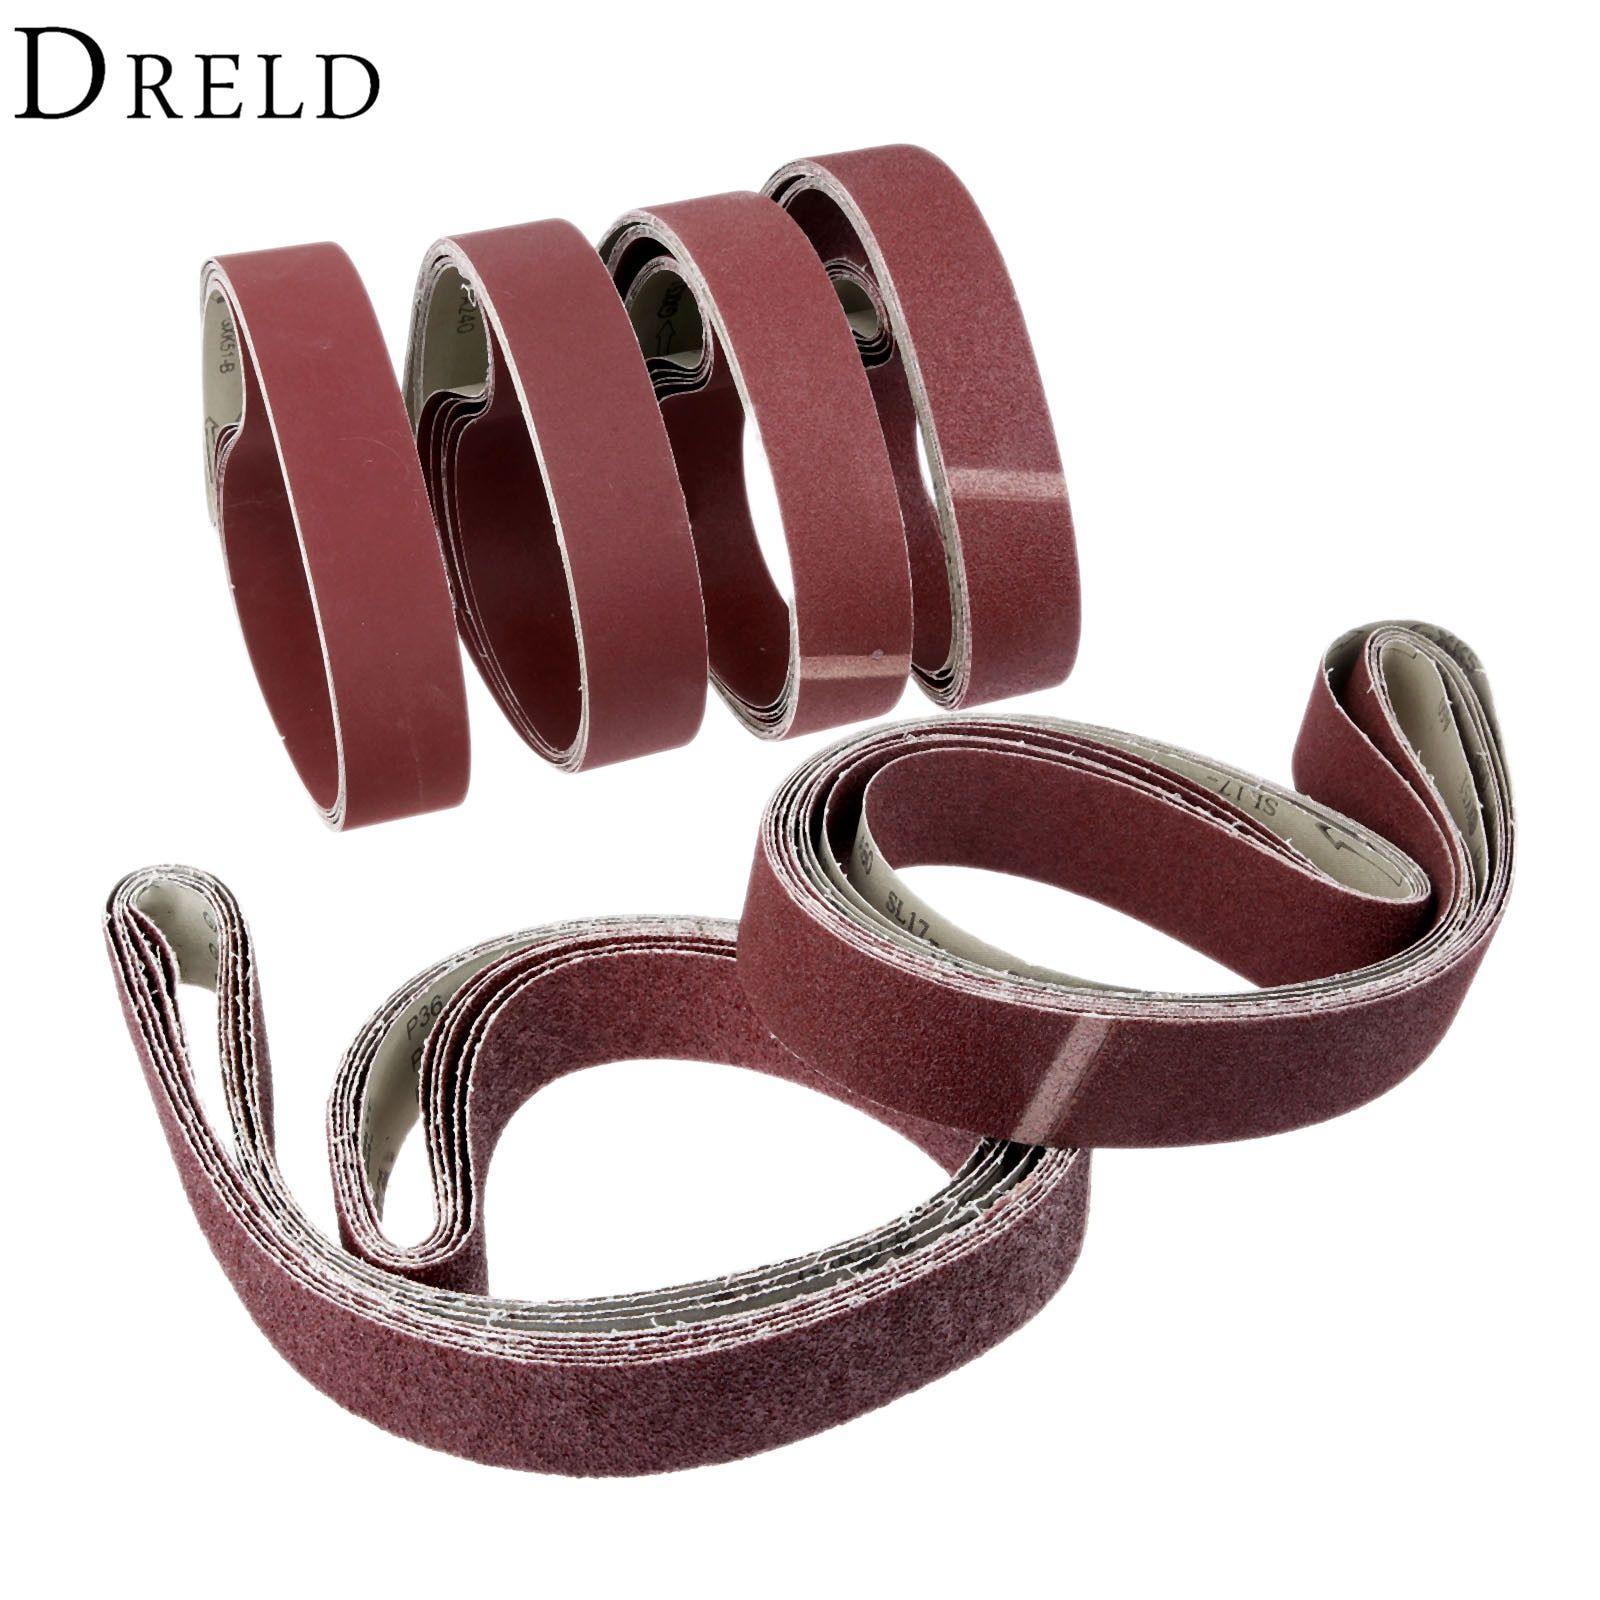 5pcs 50 1800mm Polishing Sanding Belt Aluminium Oxide Sandpaper Grinder Belt For Dremel Accessories 36 60 80 120 240 Dremel Accessories Dremel Leather Bracelet